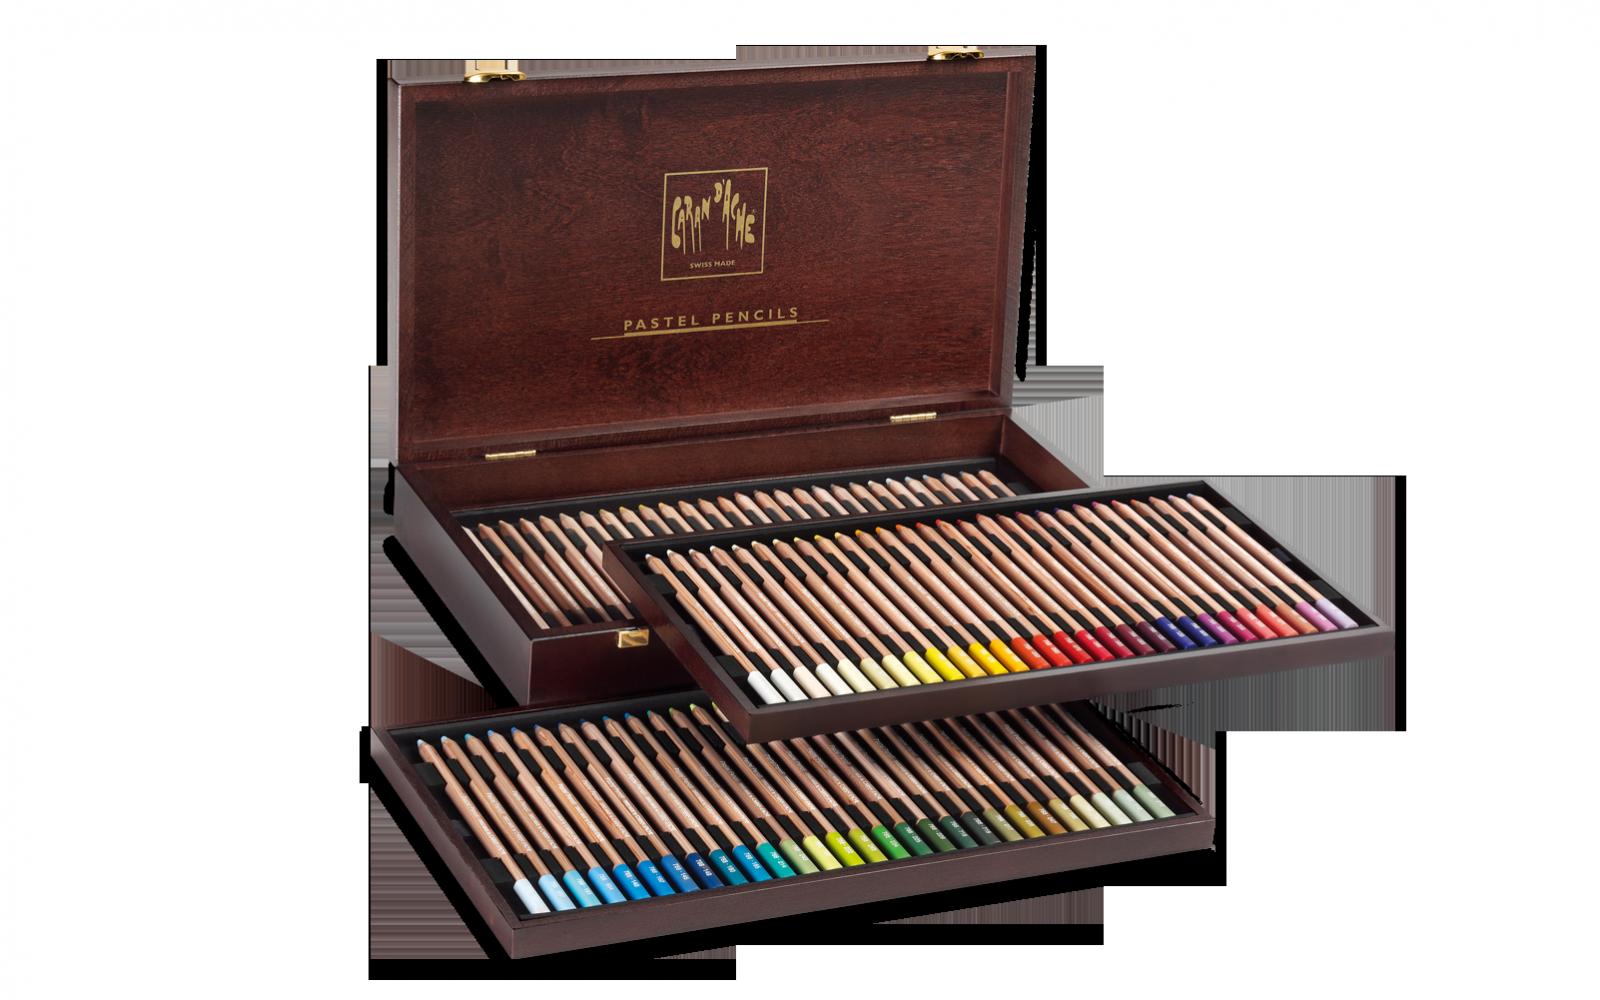 Caran Dache Pastel Pencils Azurite White 788.871